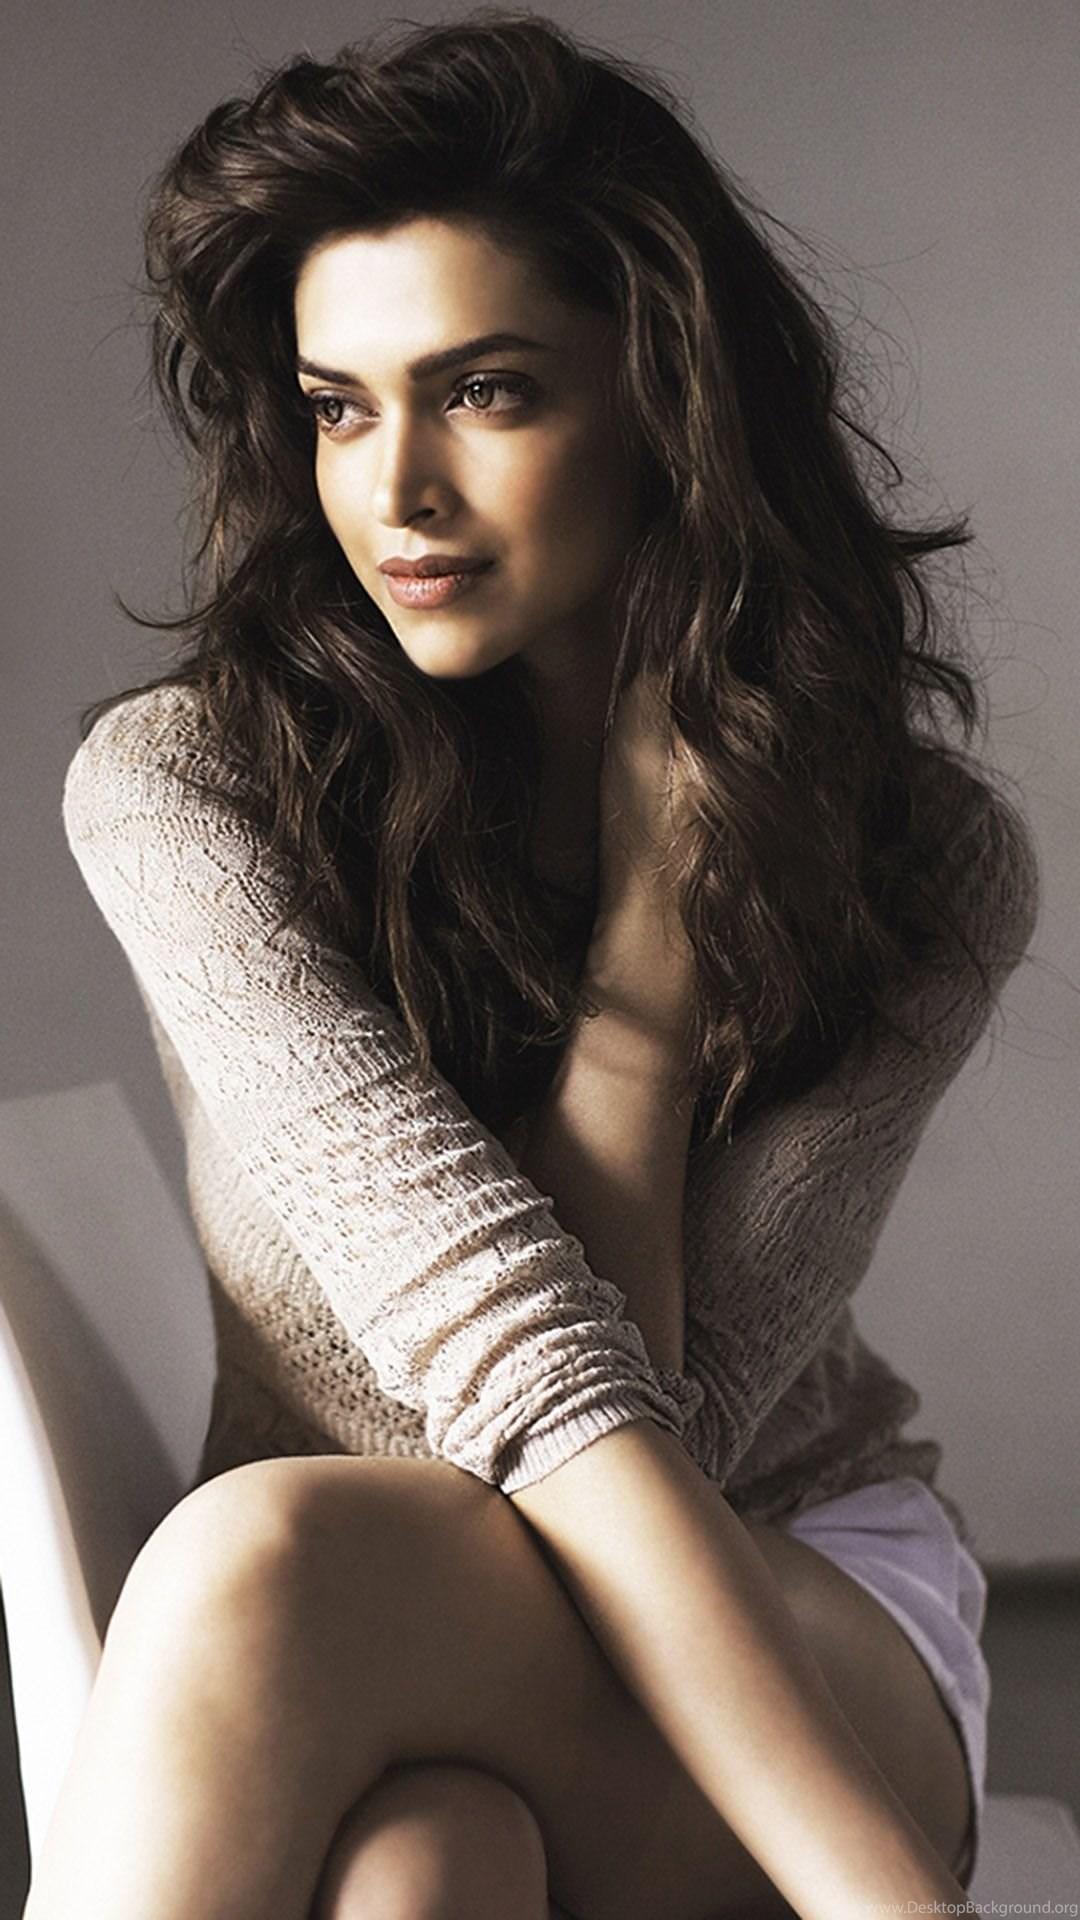 Deepika Padukone Hair Color Name In Cocktail - Deepika ...